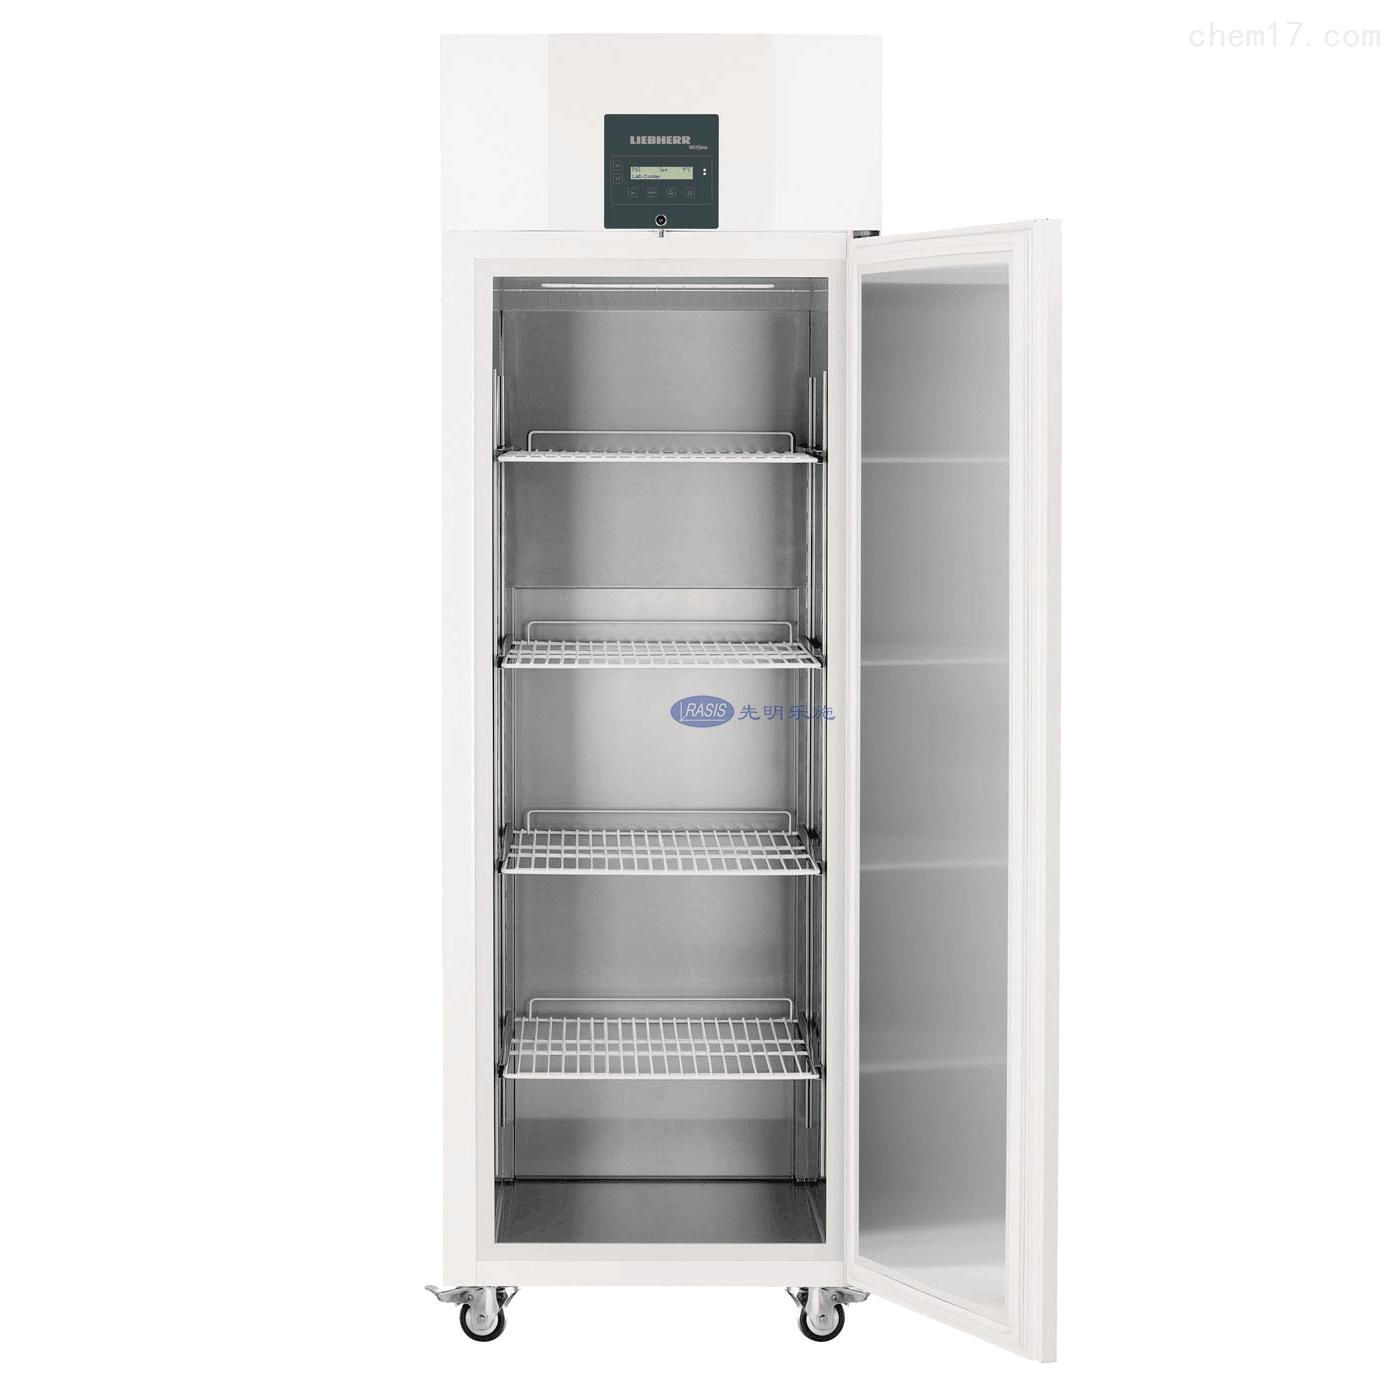 LKPv 8420旗舰型冷藏冰箱